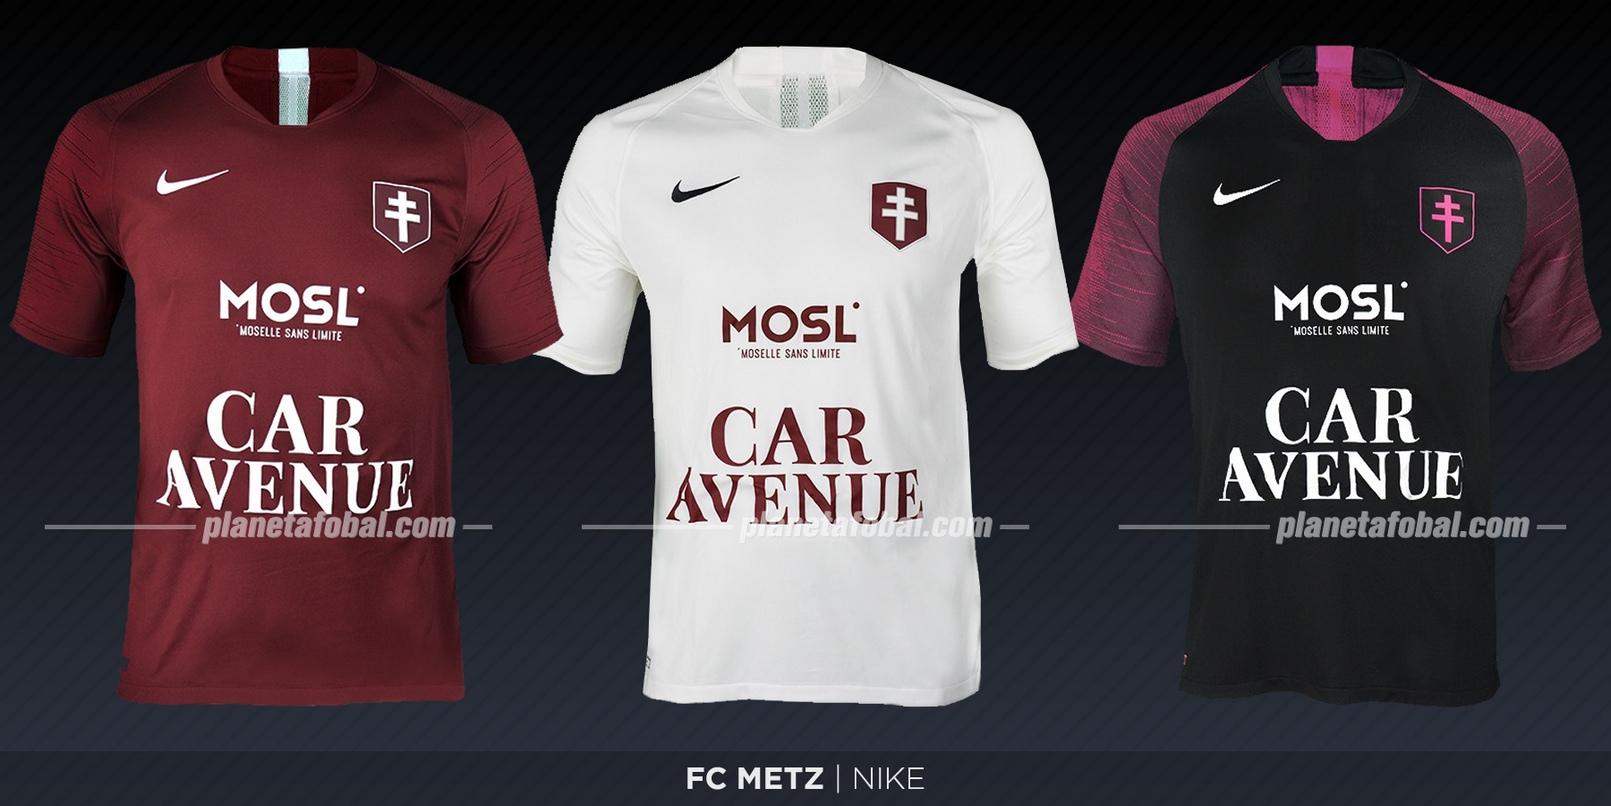 FC Metz (Nike) | Camisetas de la Ligue 1 2019-2020